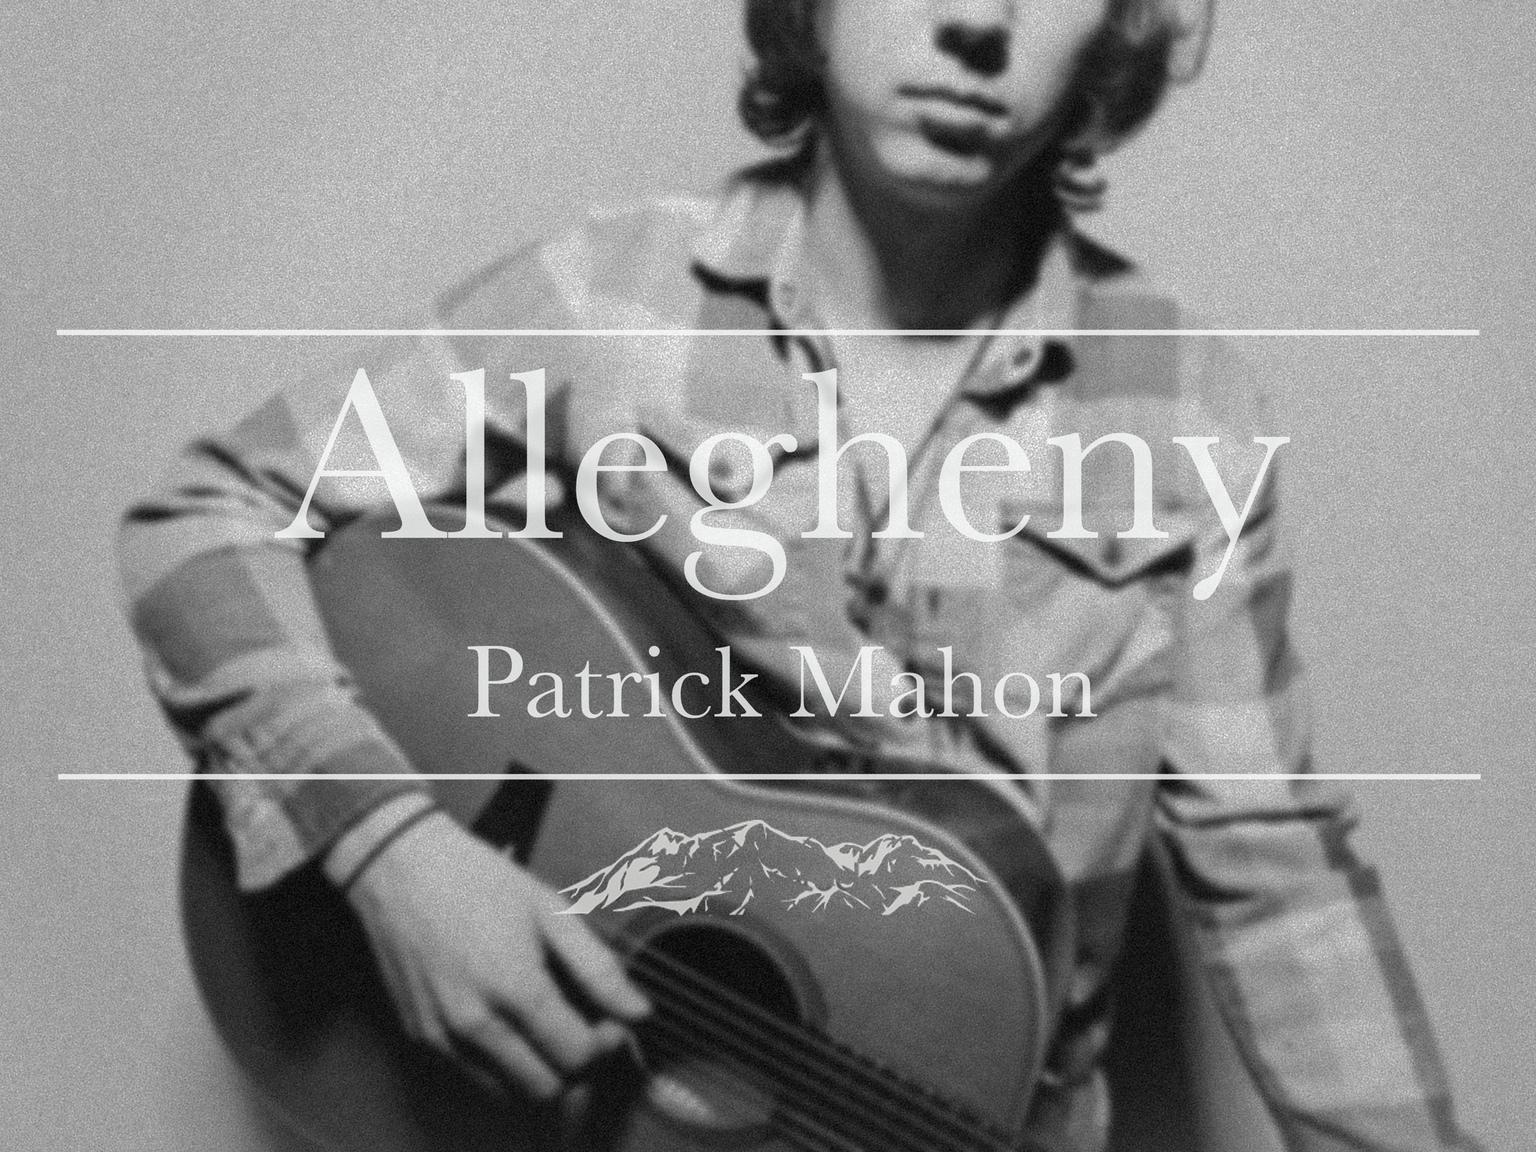 patrick mahon gallery 3